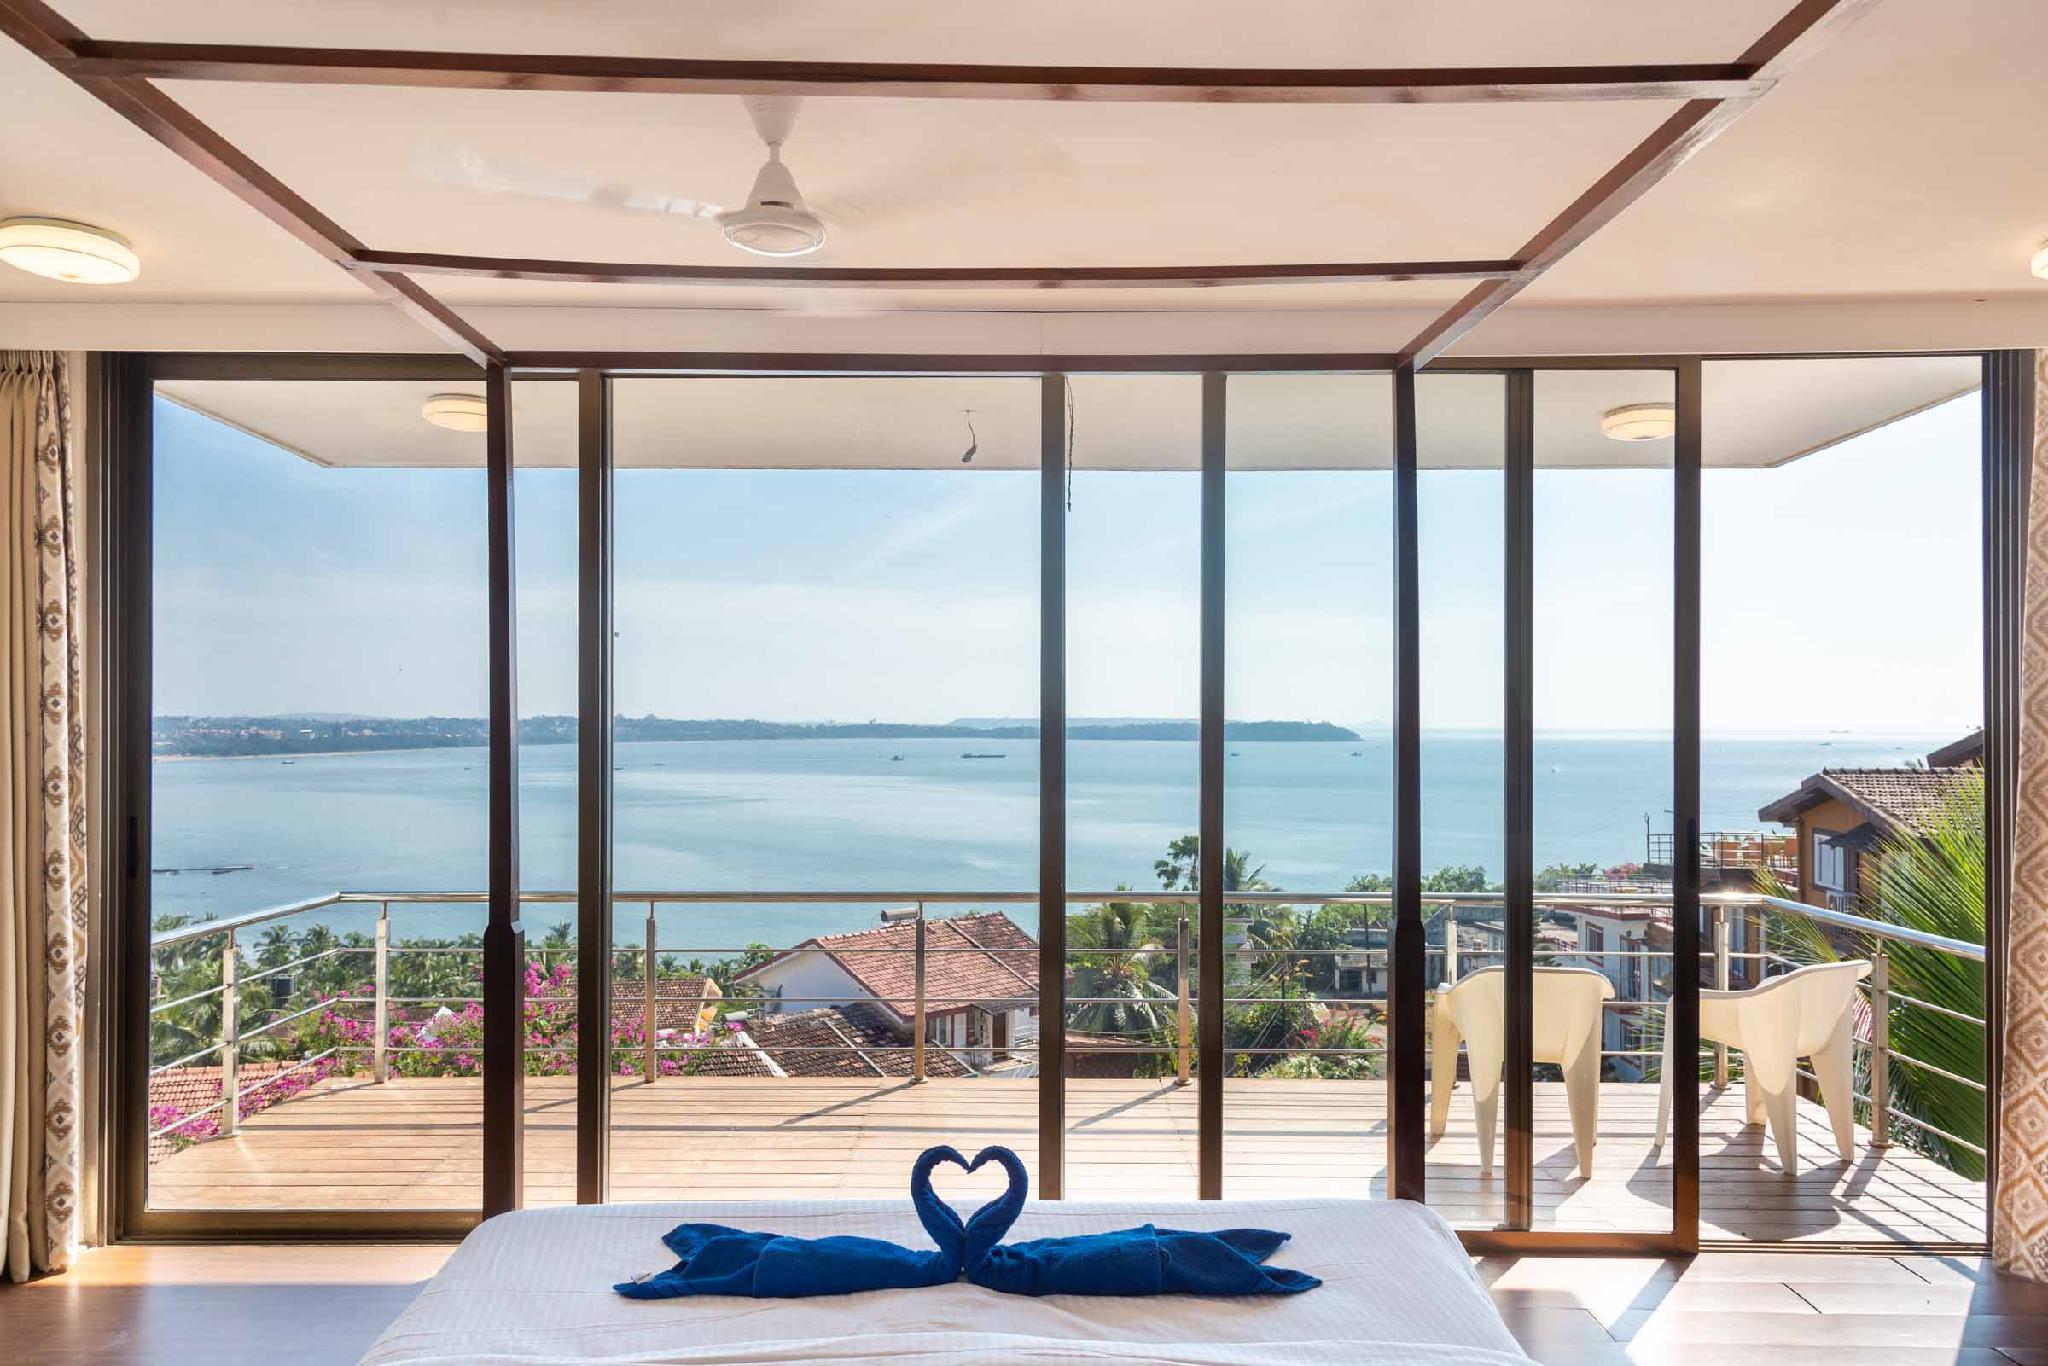 SOBERBO 4 Bedroom Sea View Villa With Private Pool